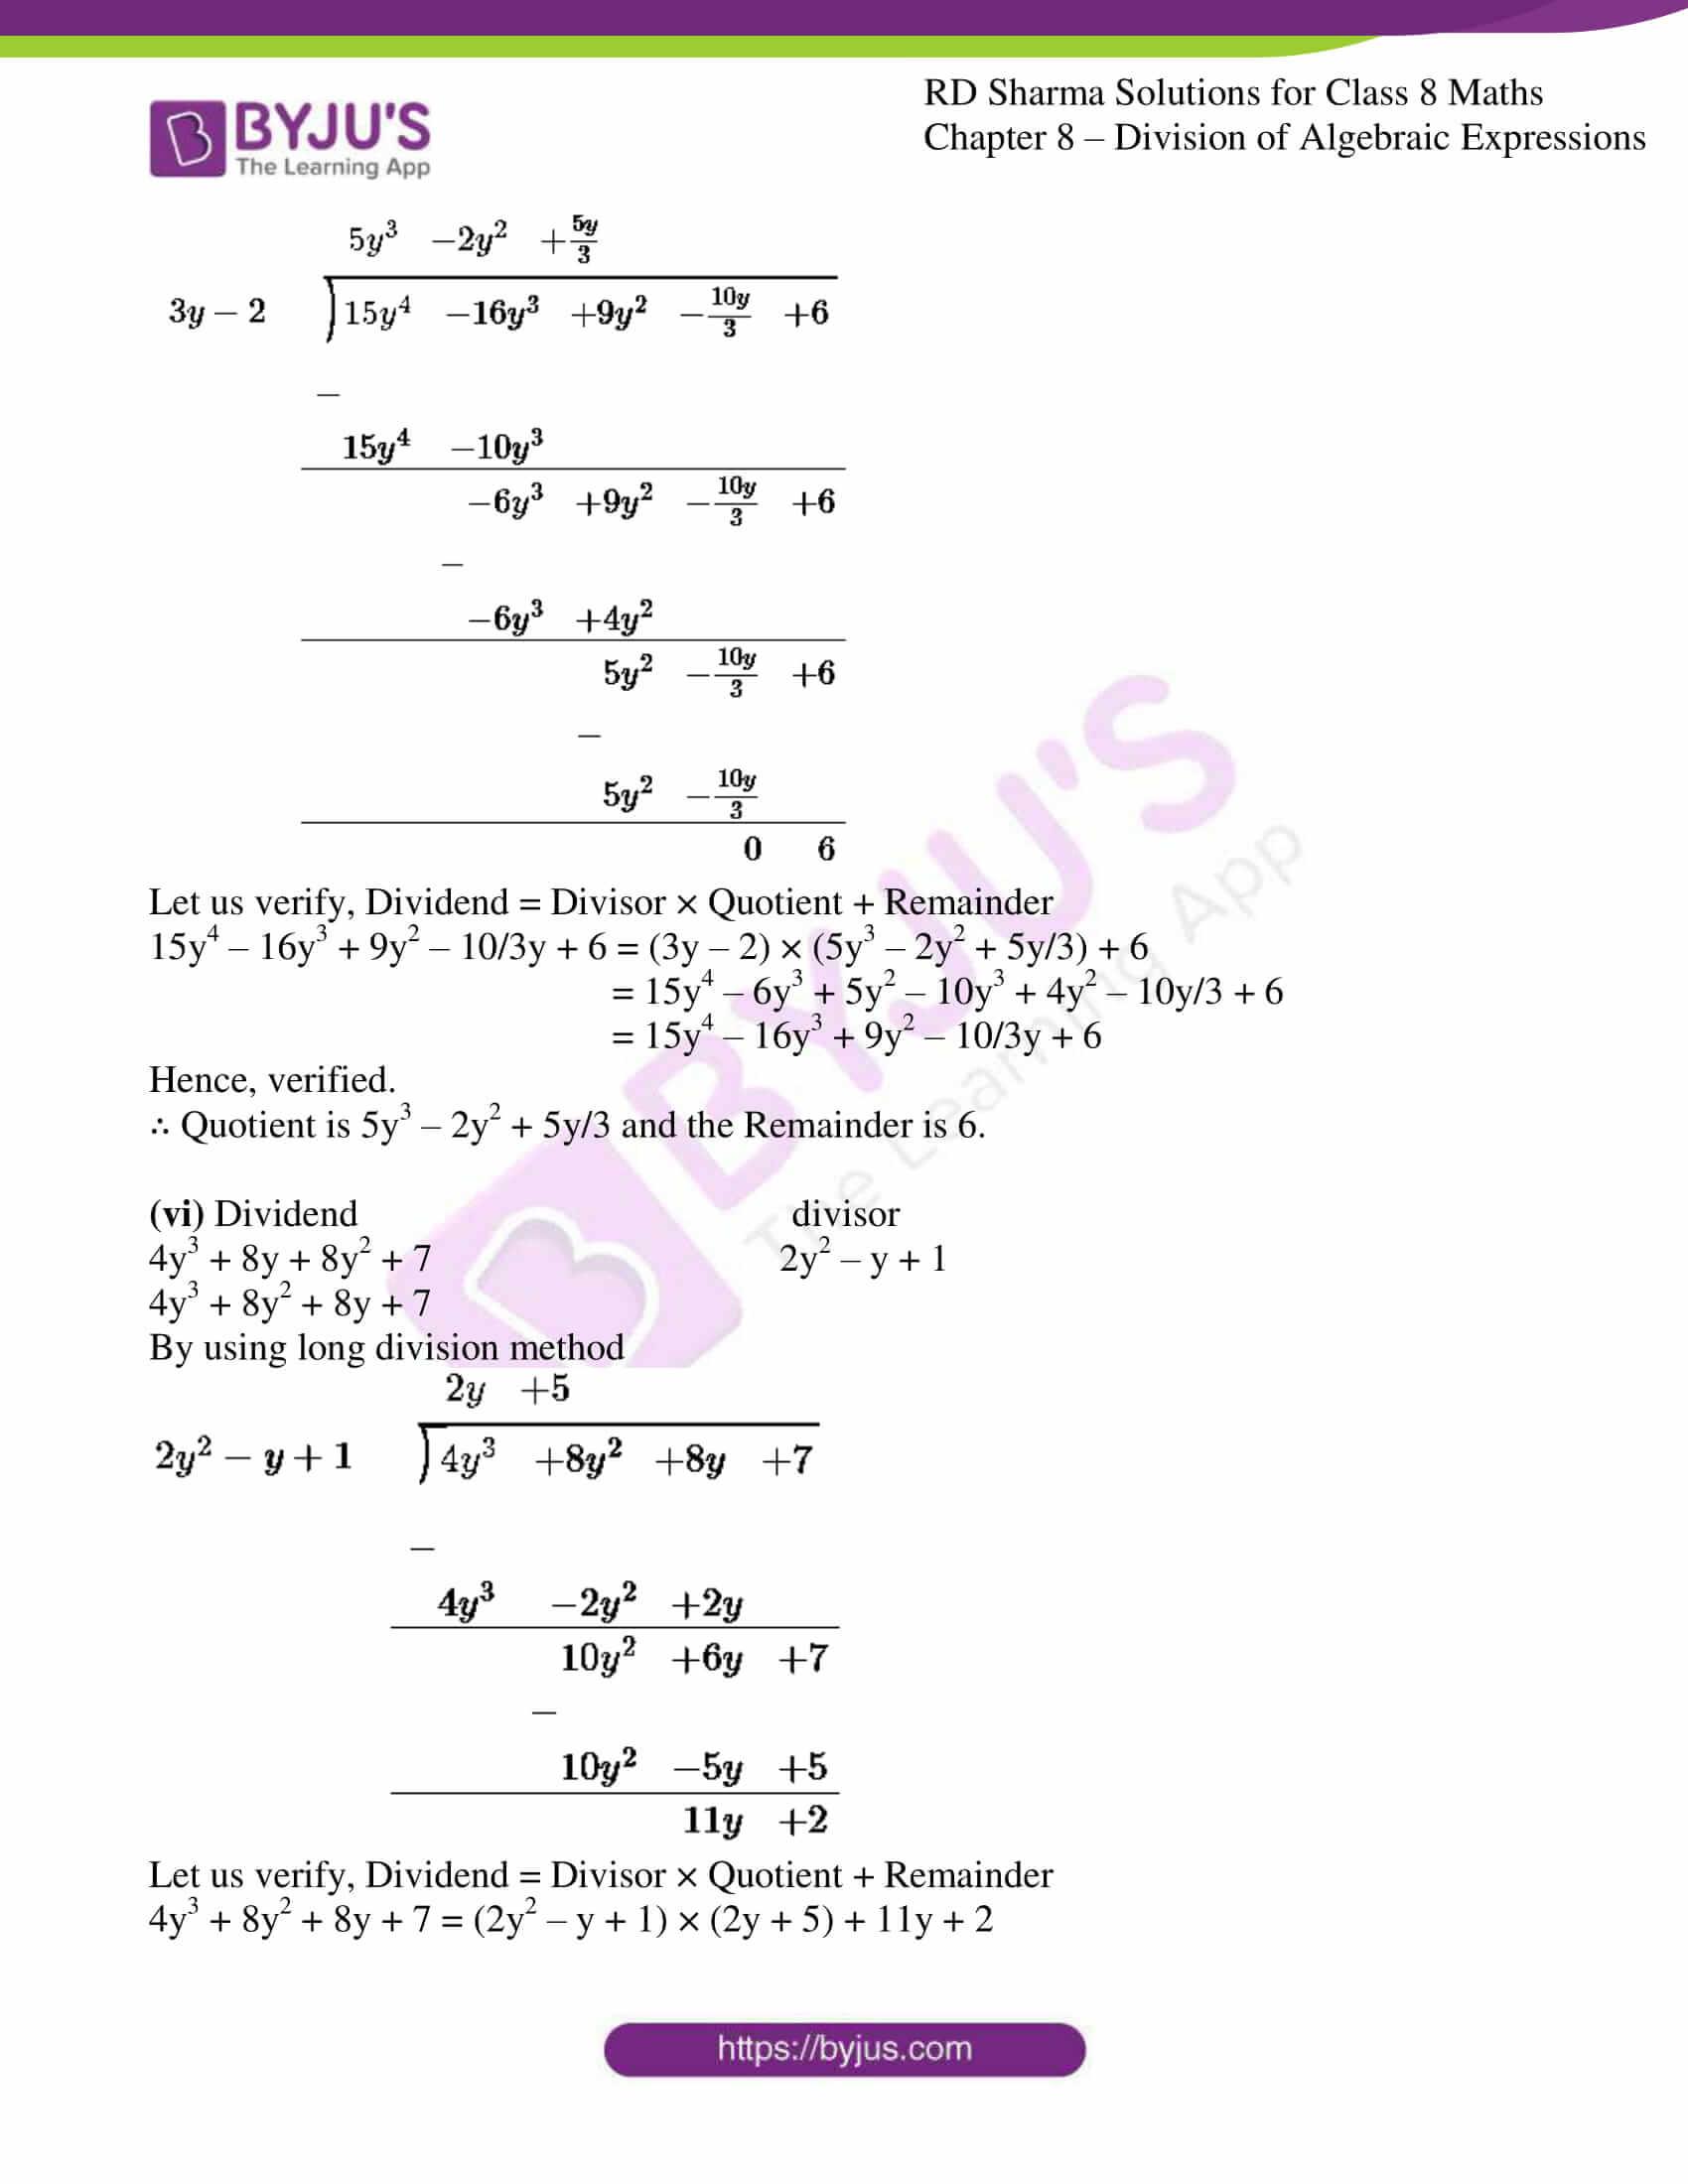 rd sharma class 8 maths chapter 8 exercise 4 13